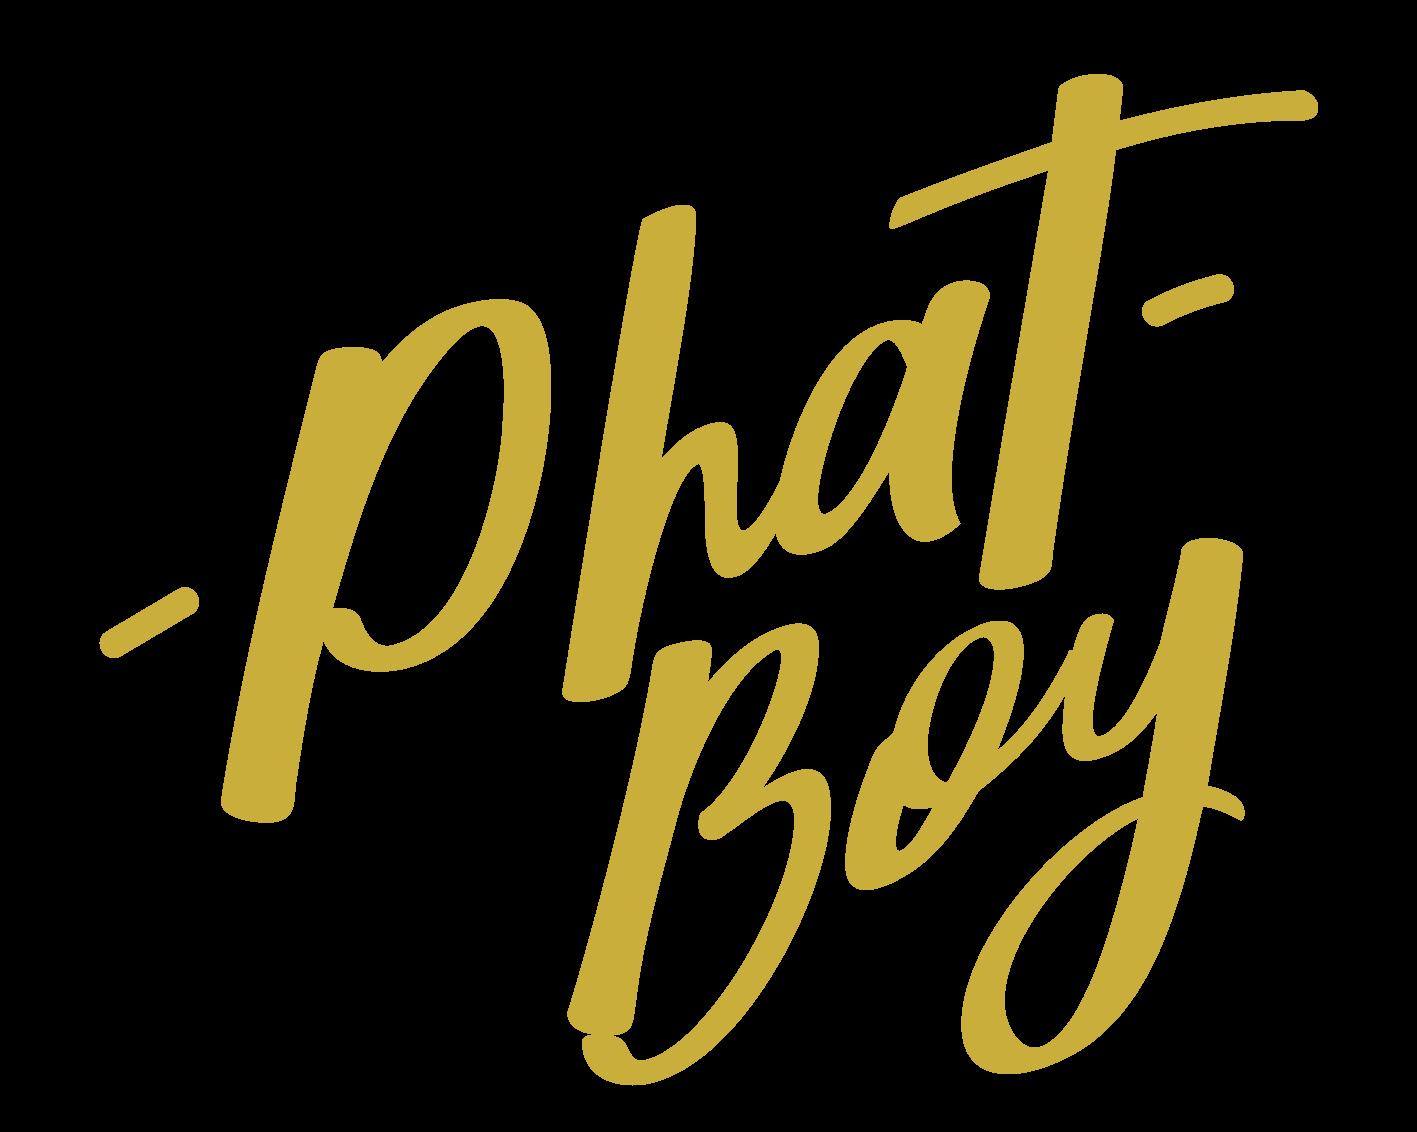 Phat Boy logo